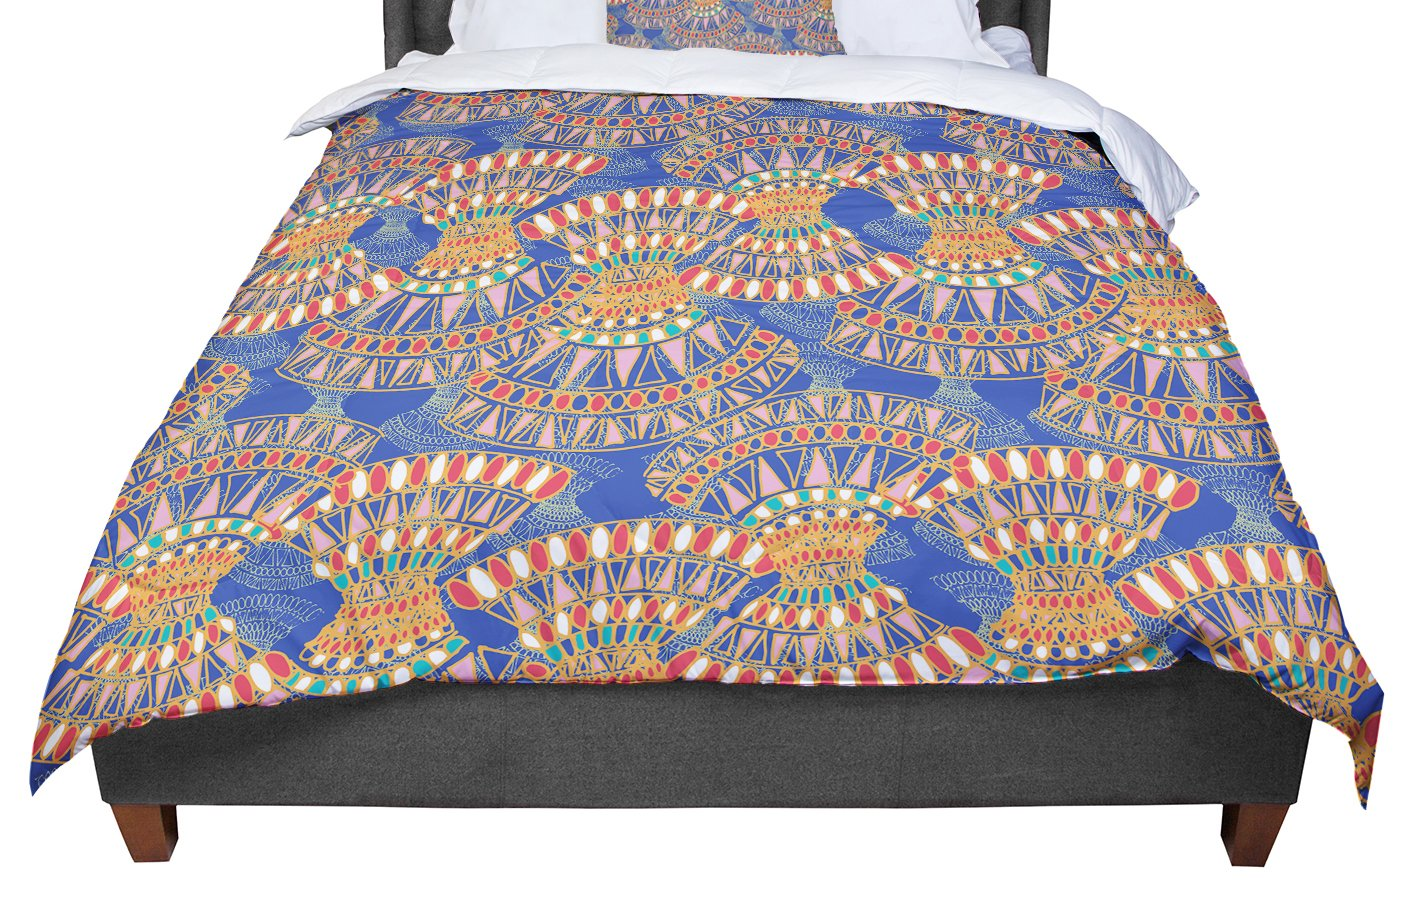 Cal King Comforter 104 X 88 KESS InHouse Miranda Mol Energy Orange Blue Abstract King